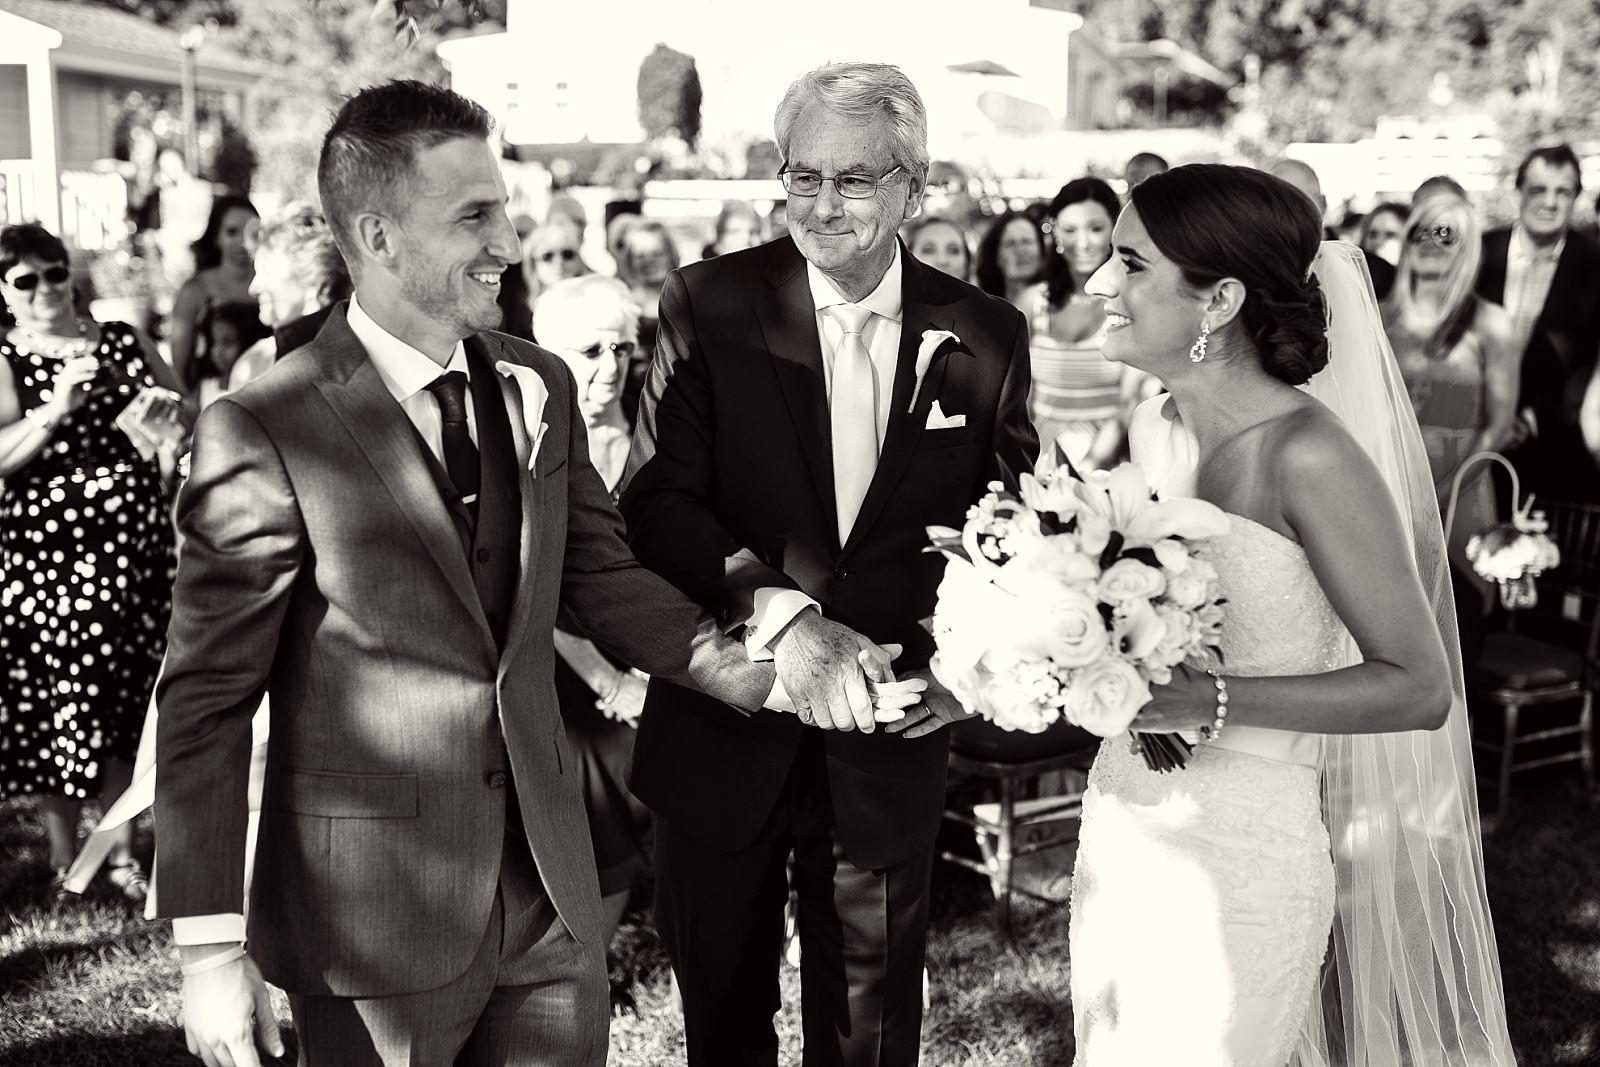 CT_Wedding_Photographer_LiNa_Wed_38.jpg